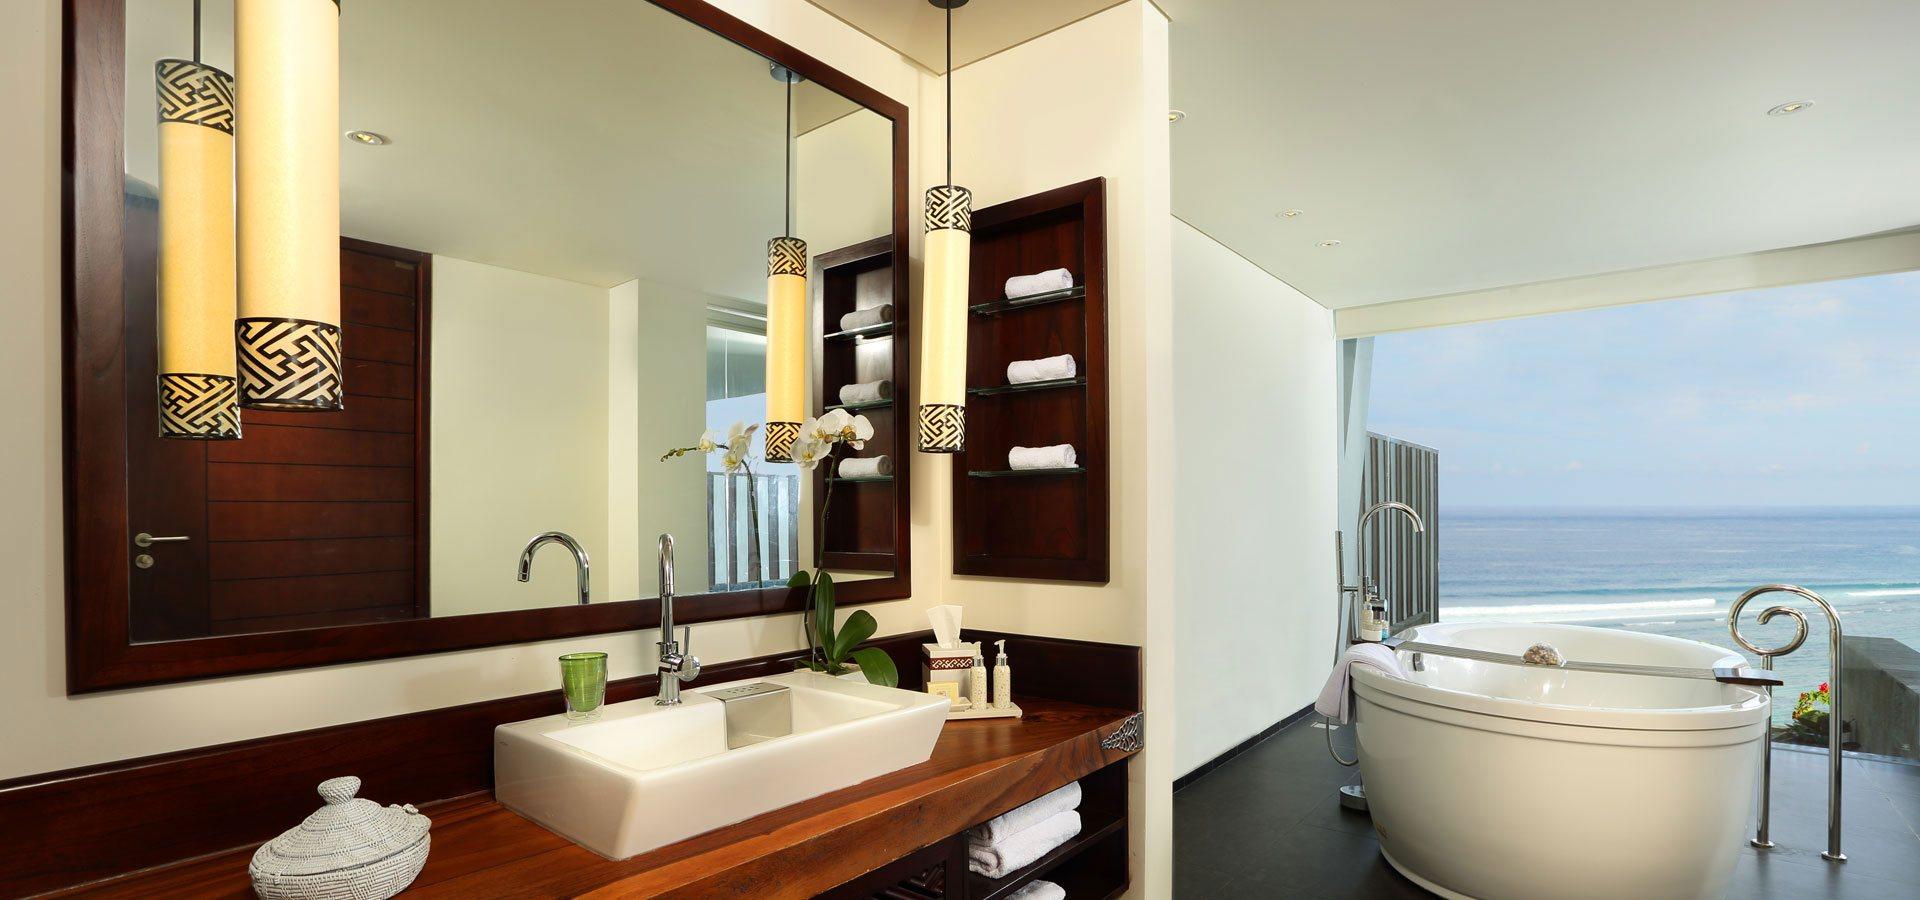 Sanibel Island Hotels: Bali Resorts Bali Suites Luxury All Inclusive Ocean View